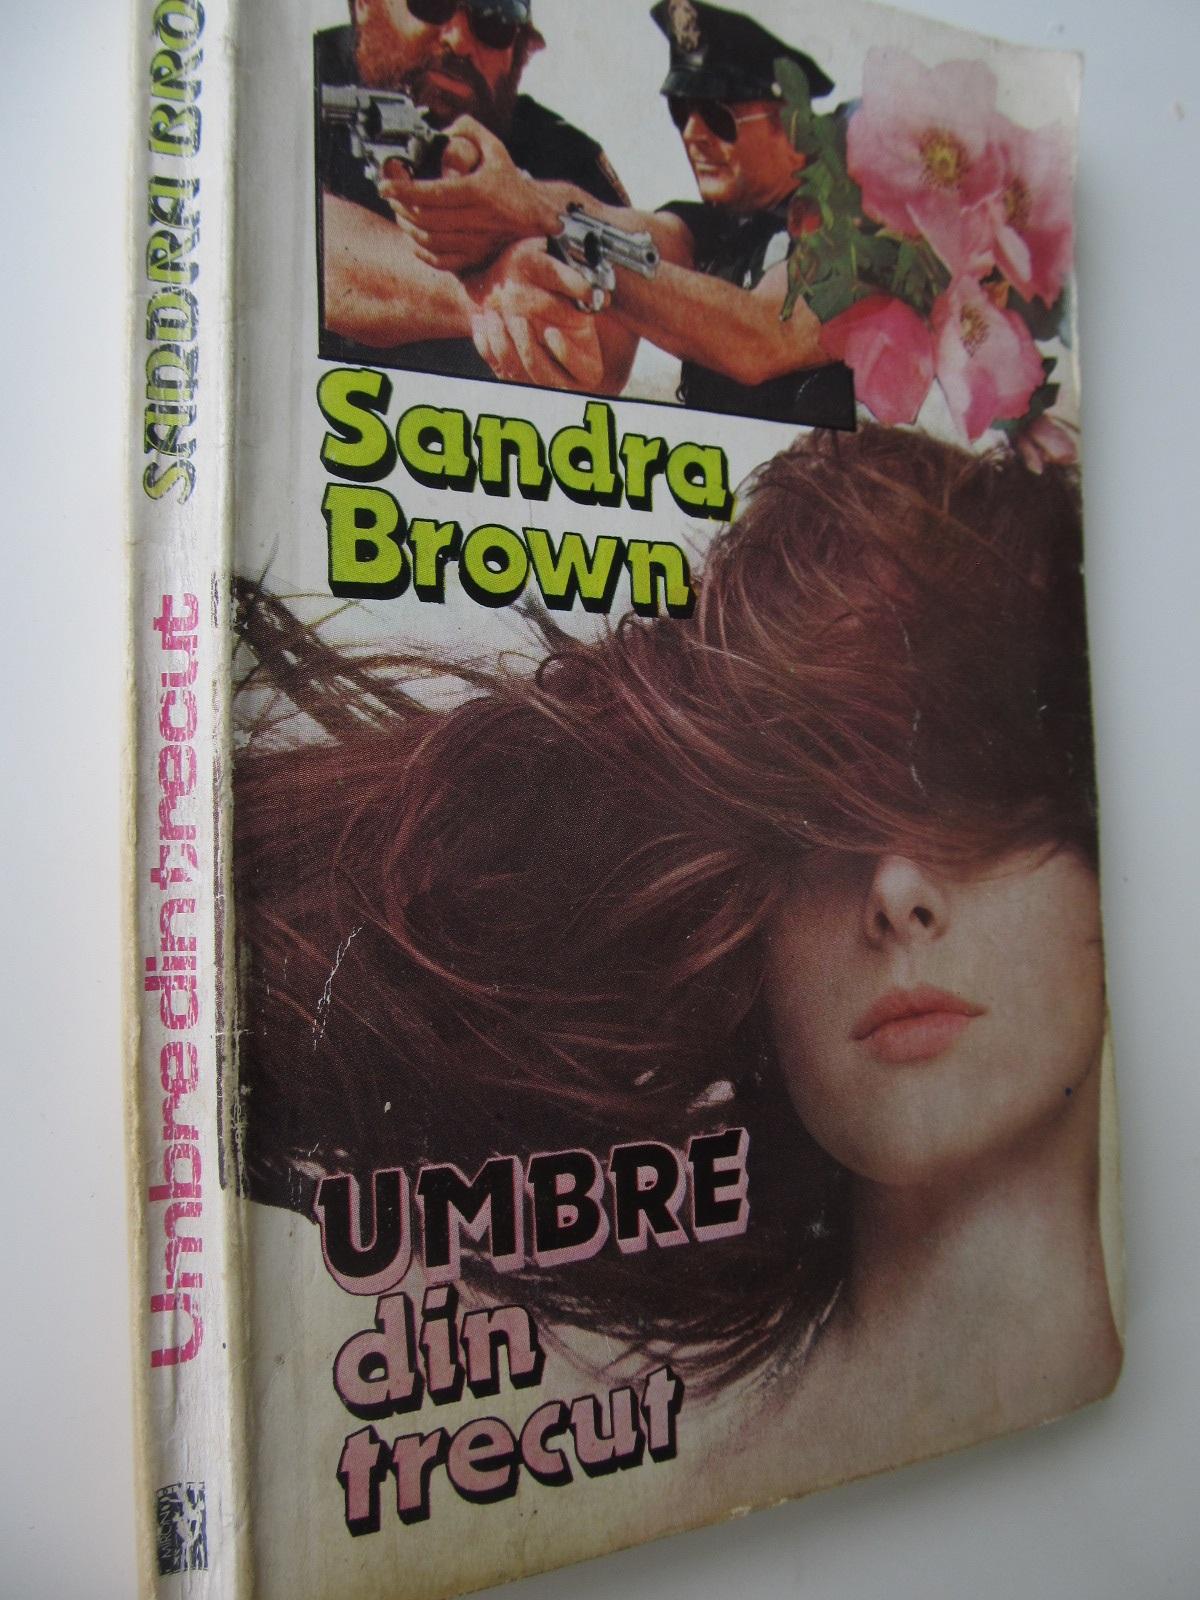 Umbre din trecut - Sandra Brown | Detalii carte